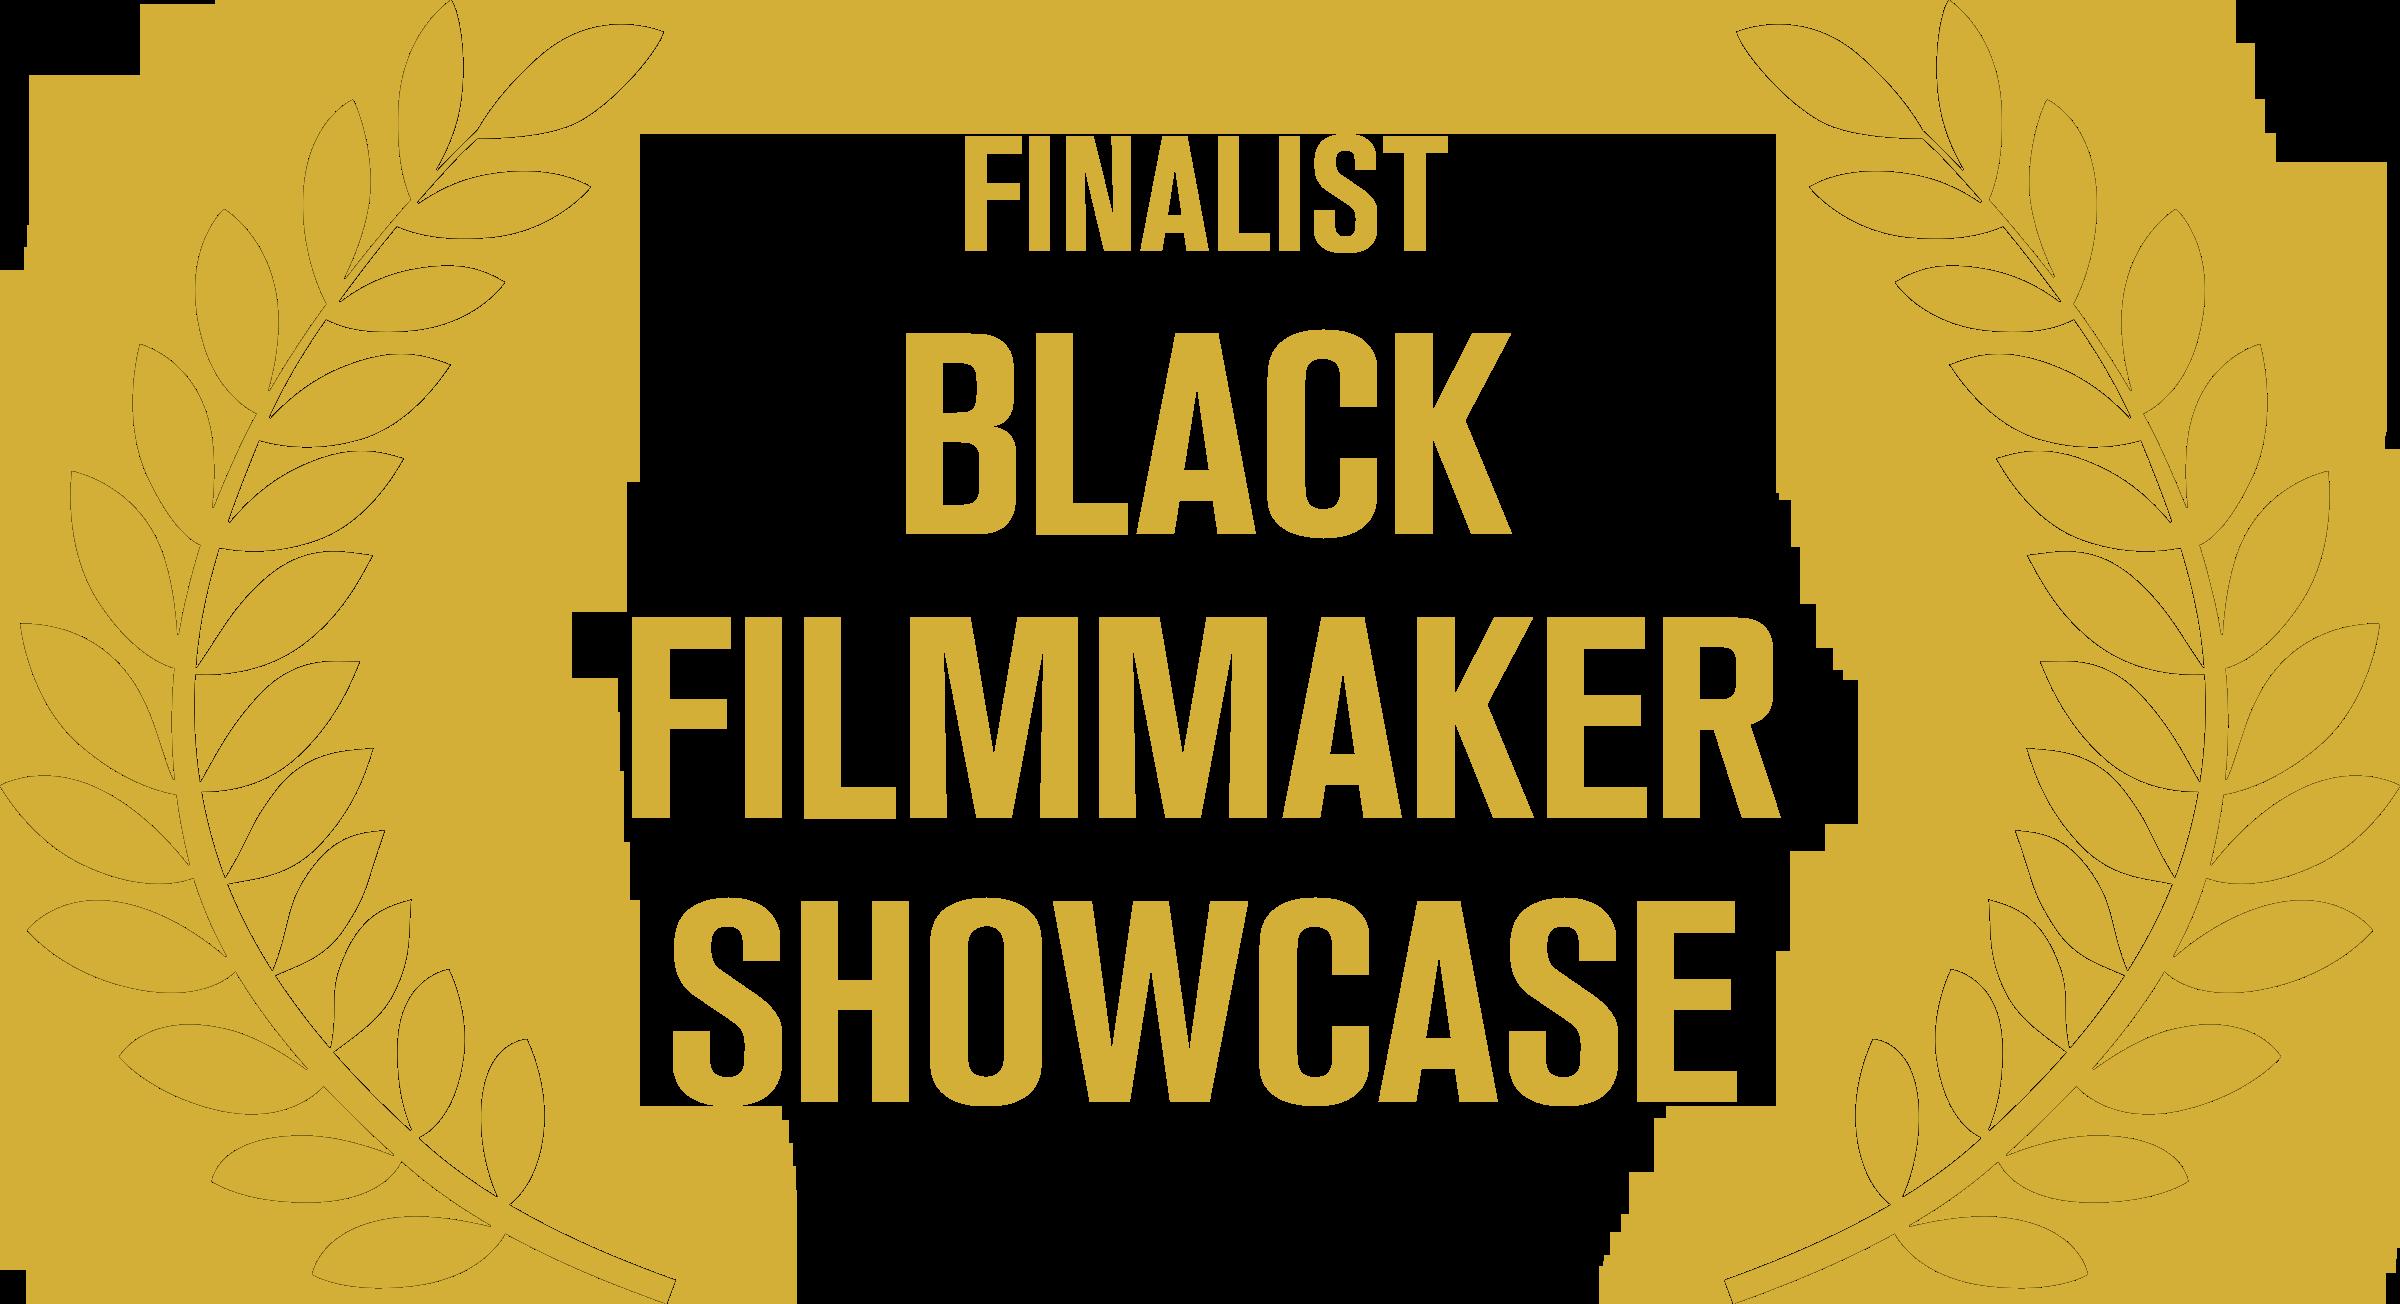 Laurel_Black Filmmaker_finalist.png